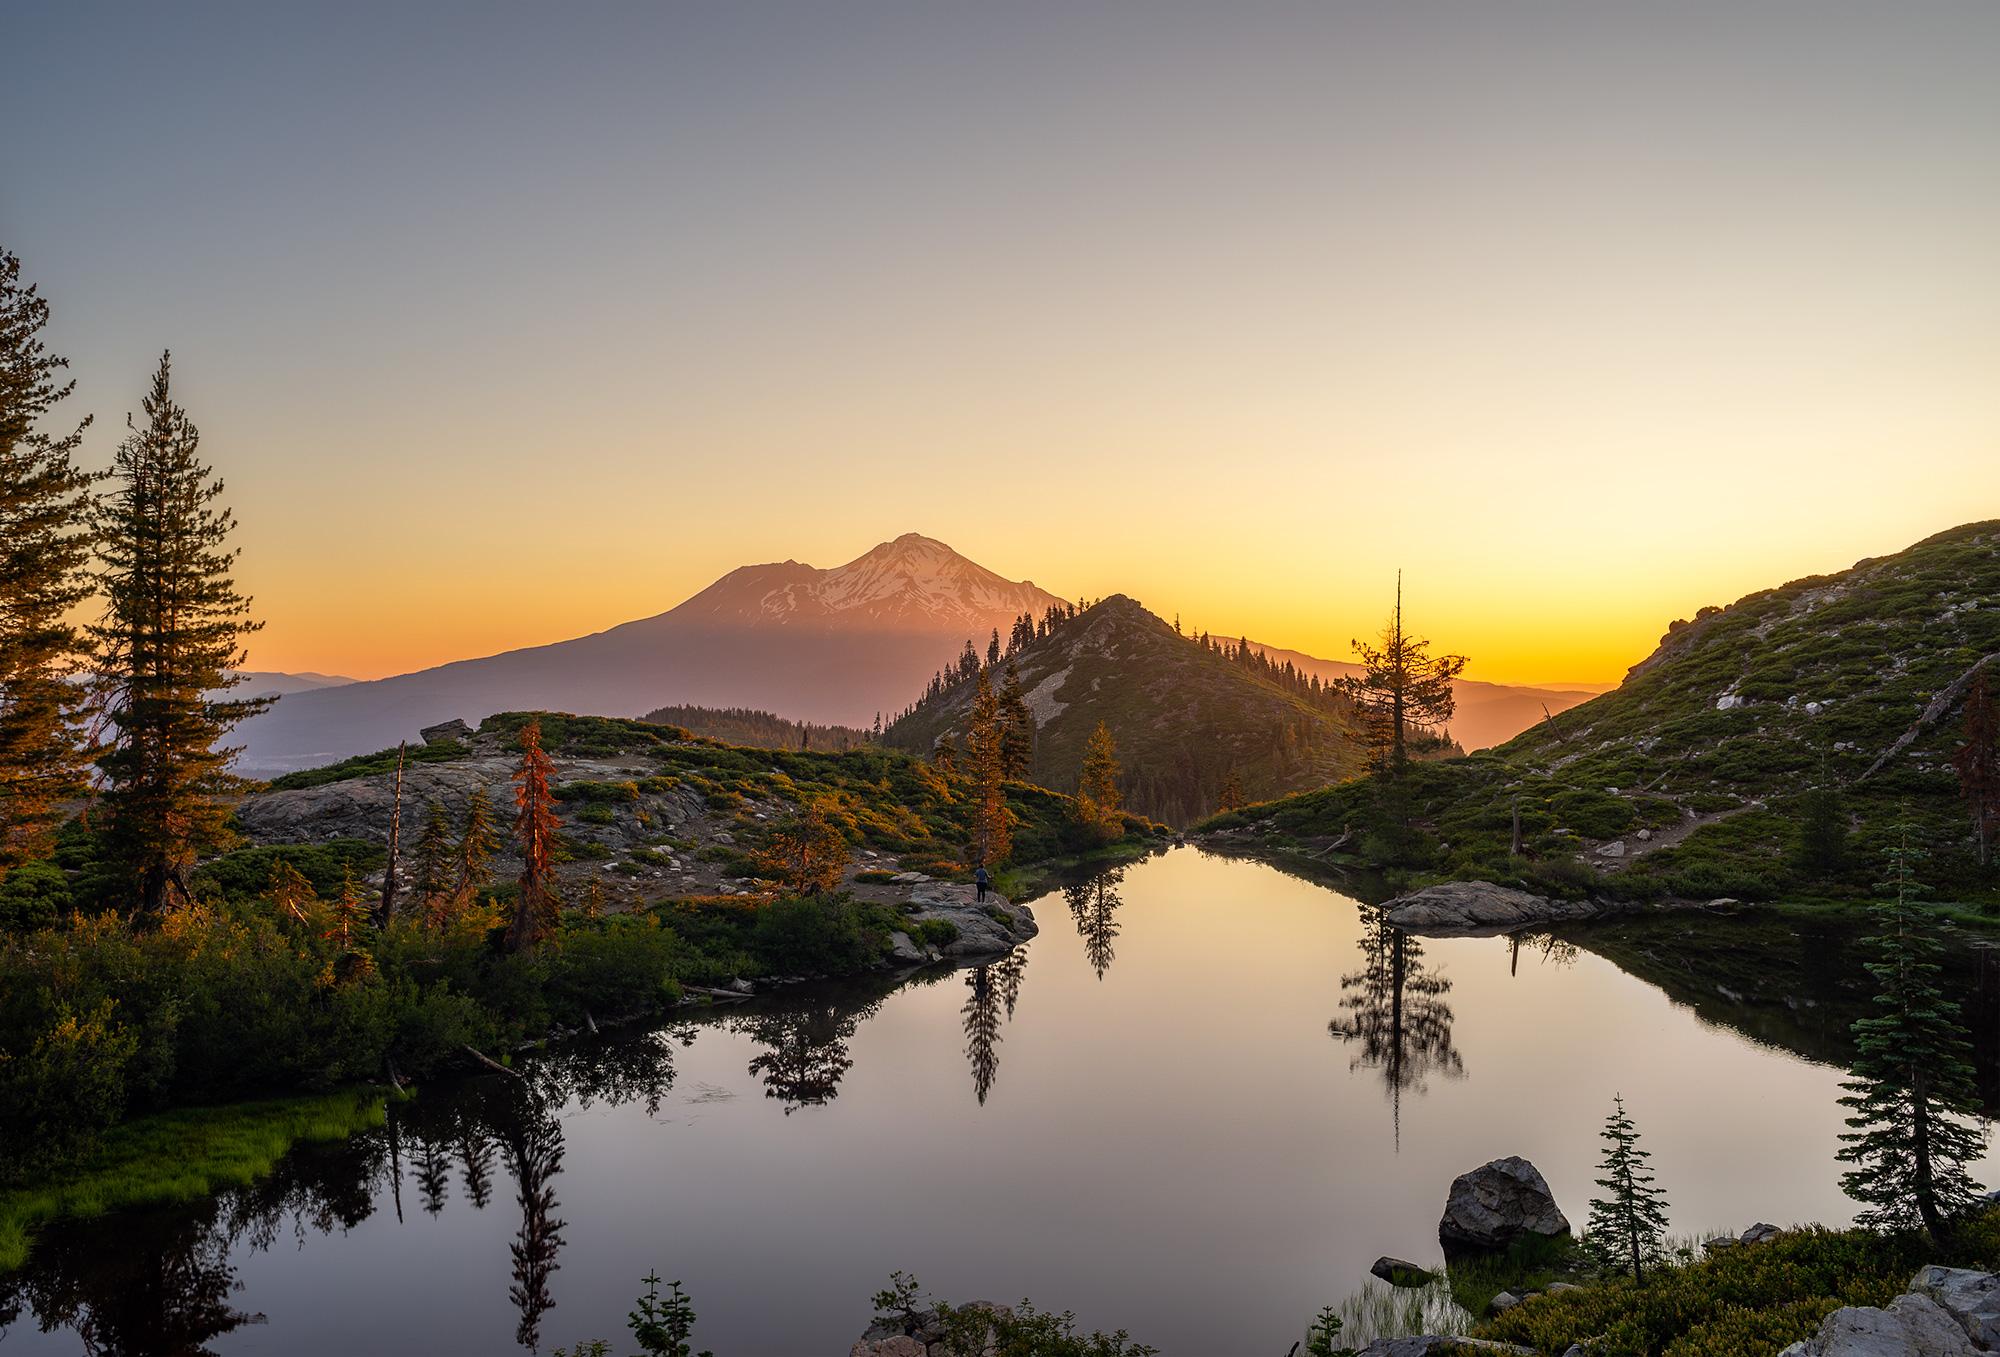 Higher up on Heart Lake at sunrise.